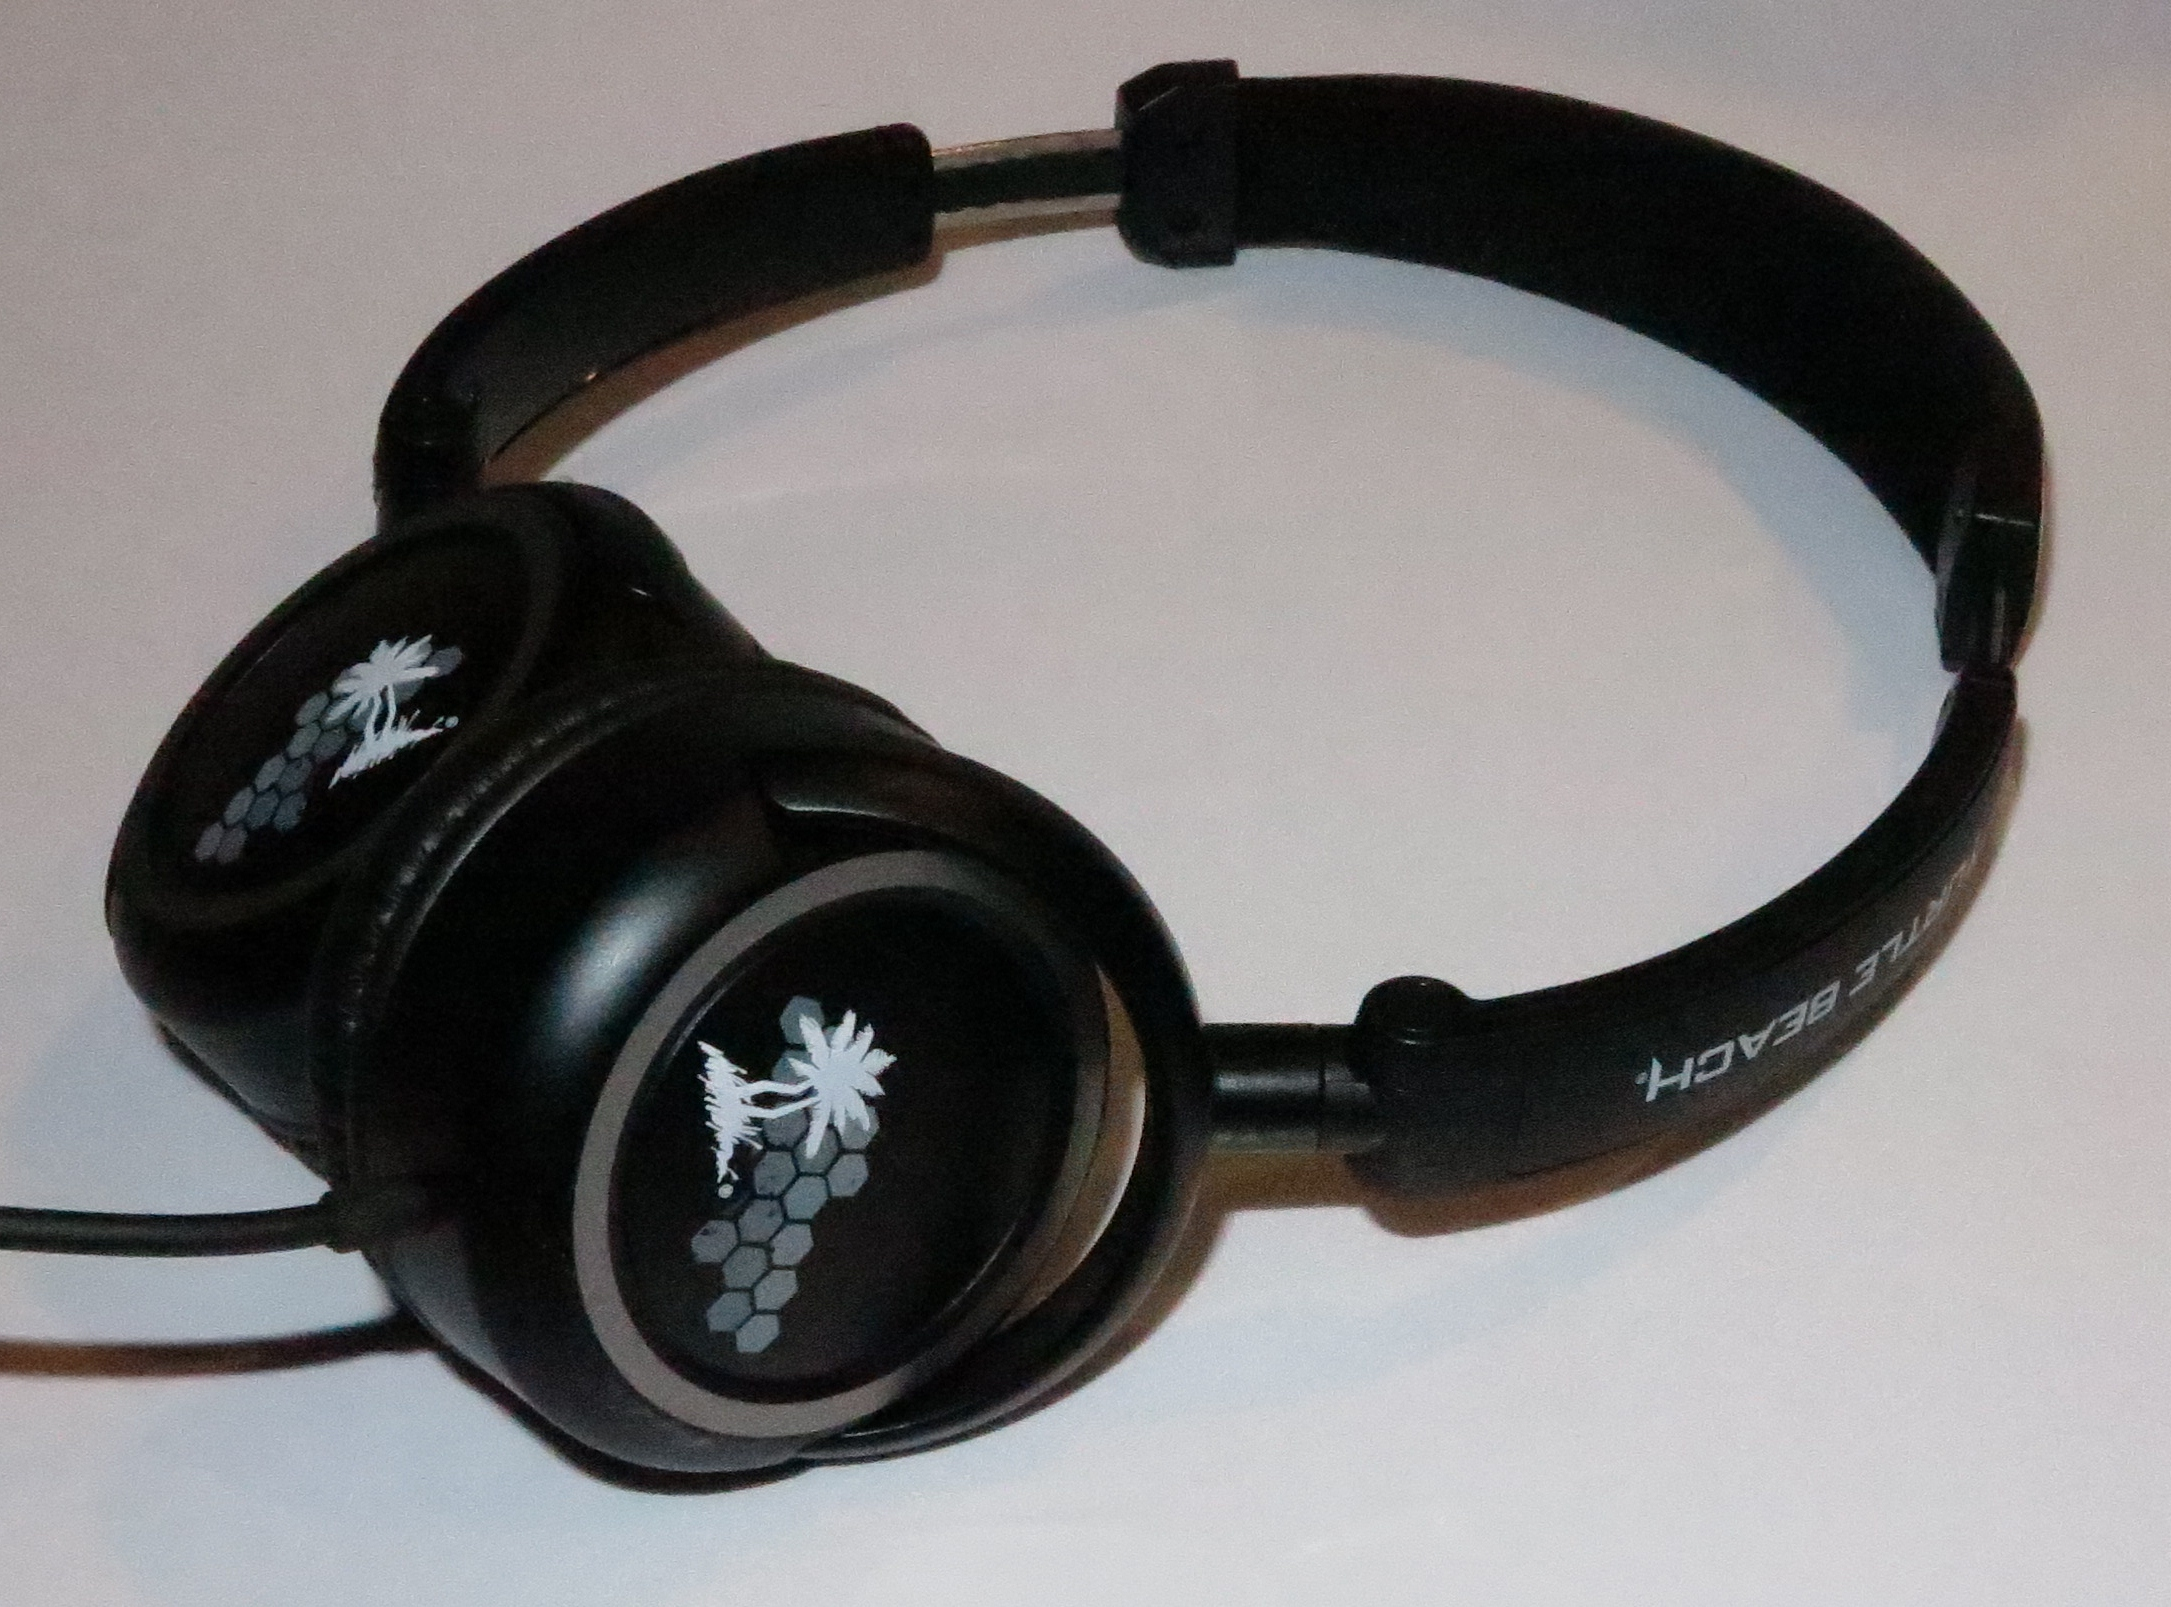 Voyetra Turtle Beach M3 gaming headset